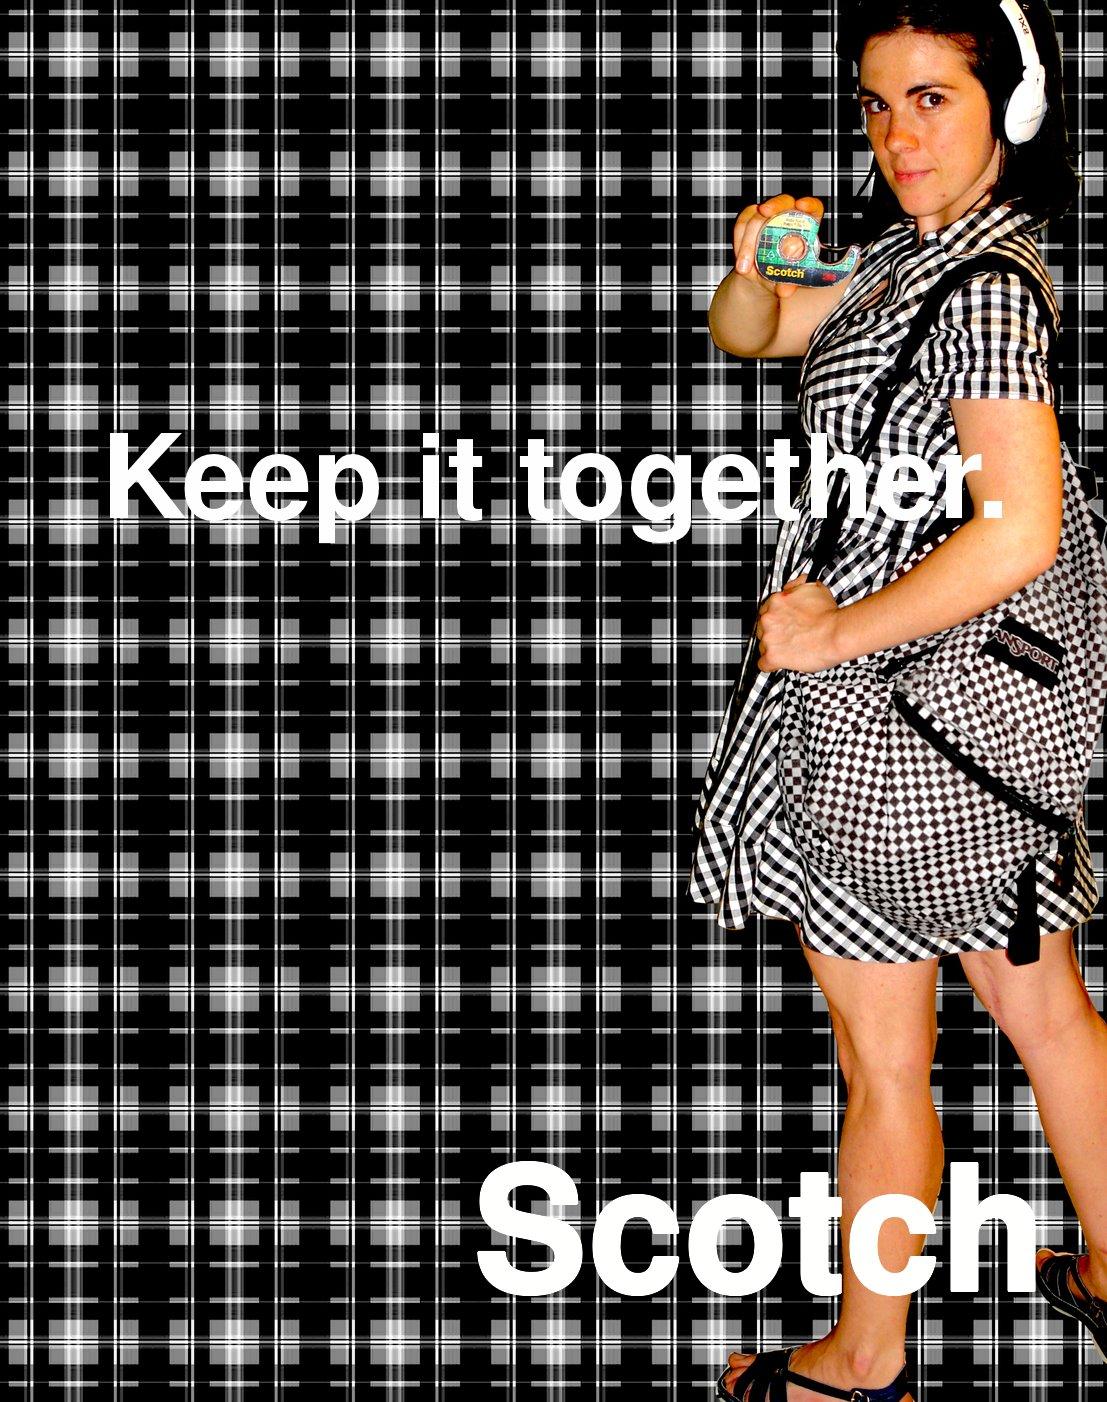 Scotch Tape ad.jpg